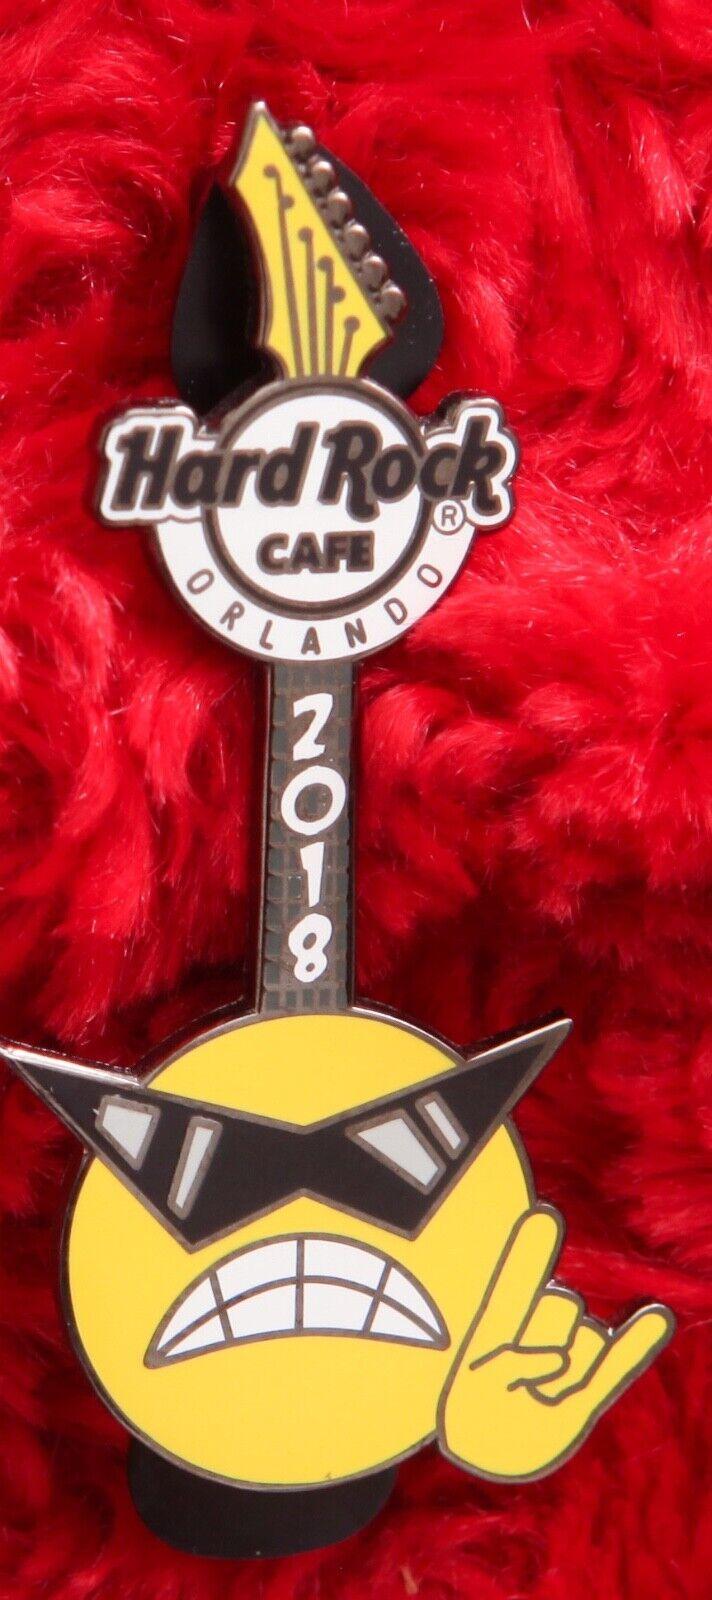 Hard Rock Cafe Pin Orlando Rockmoji Smiley Face Guitar Sunglasses Hat Lapel - $9.99